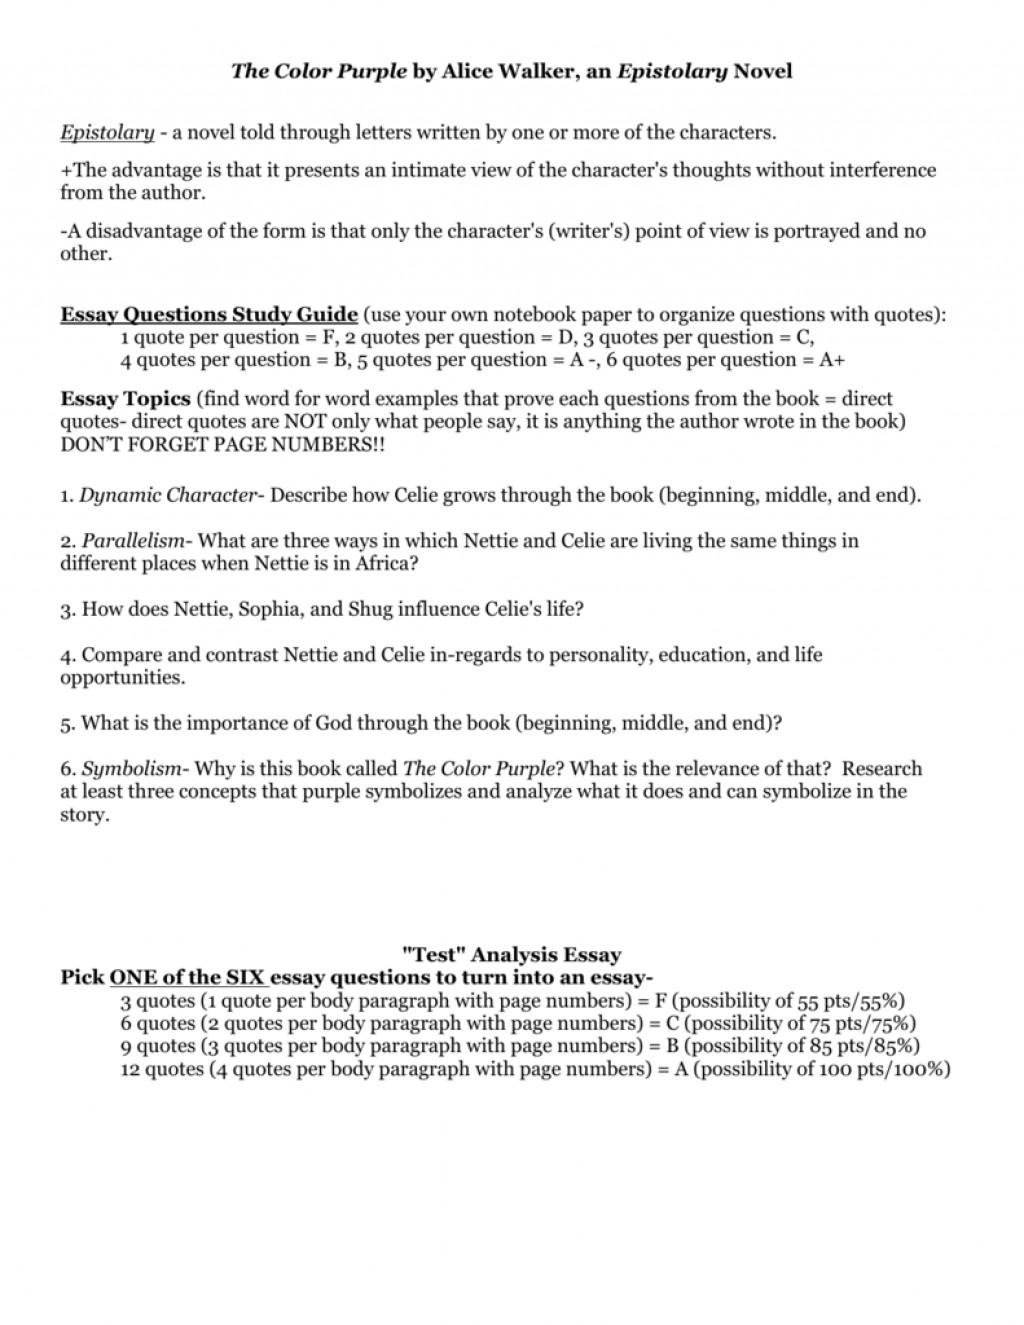 004 008011197 1 The Color Purple Essay Impressive Research Paper Outline Introduction Large